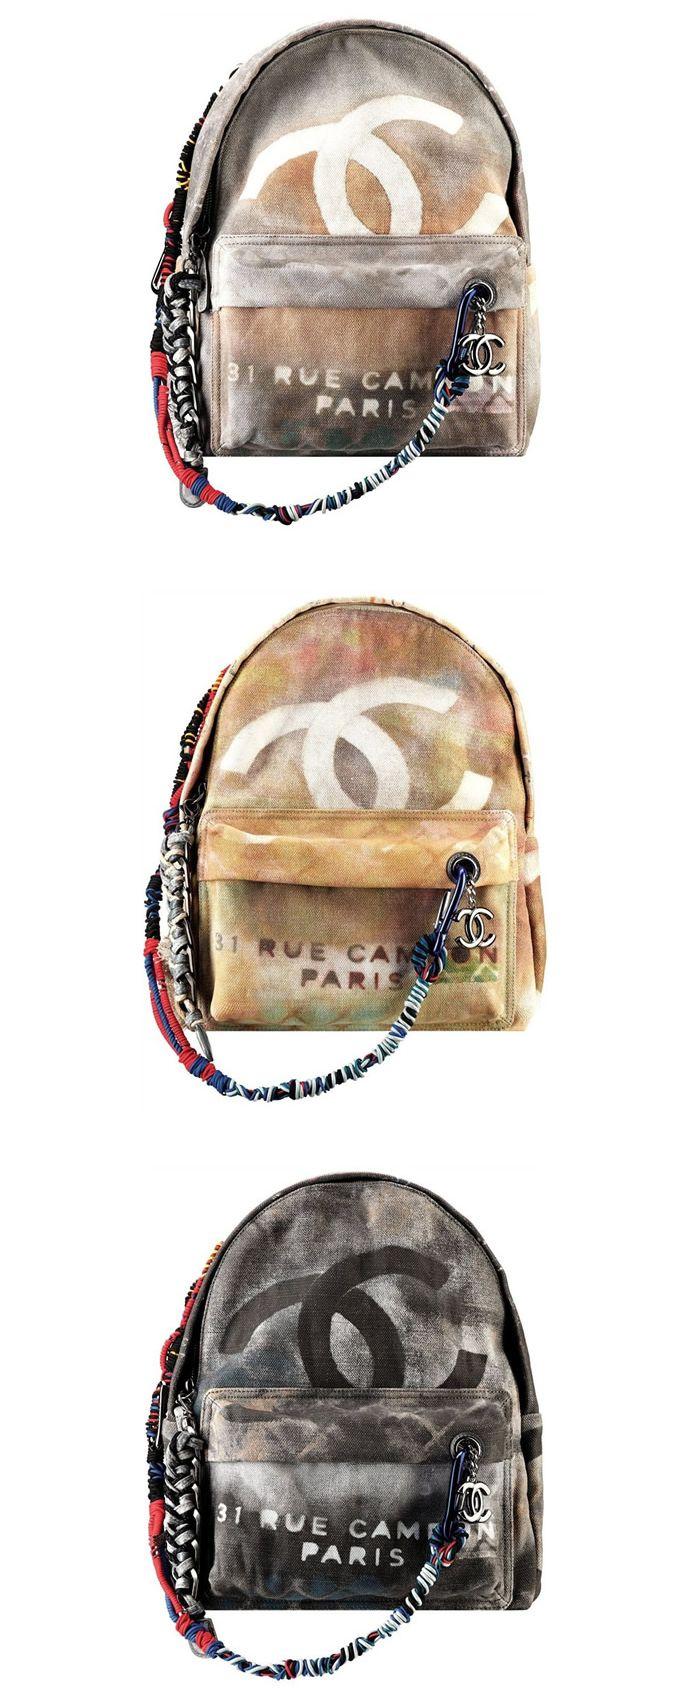 Chanel Backpacks 2014 total love